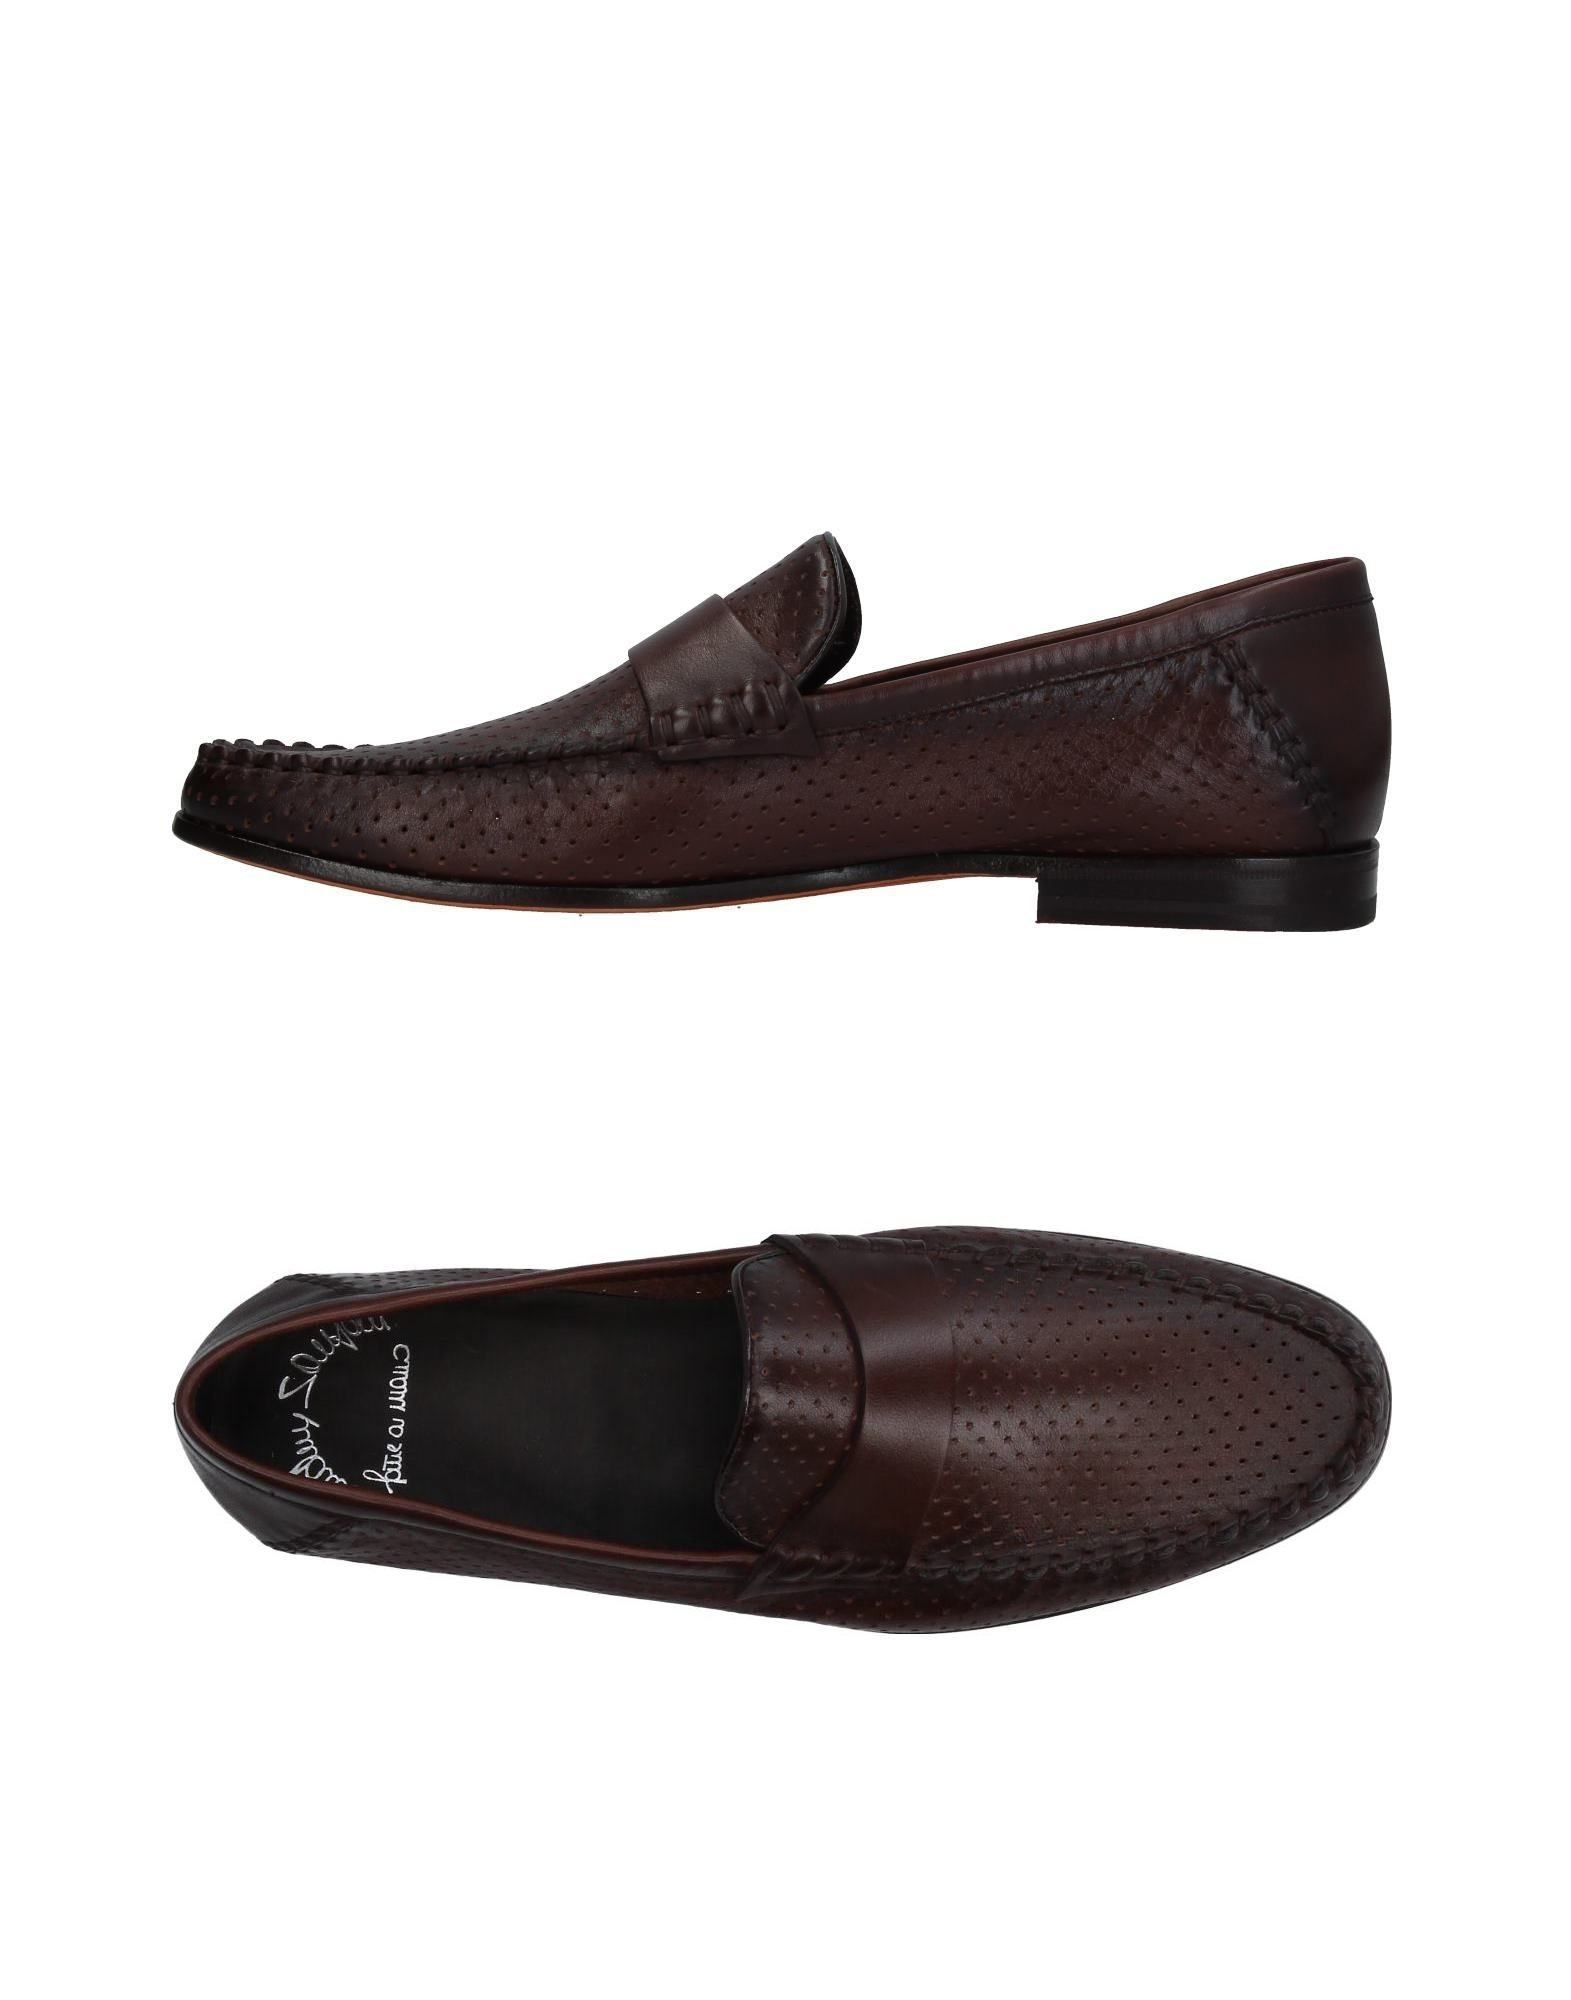 Santoni Mokassins Mokassins Mokassins Herren  11410779FS Heiße Schuhe 370ada